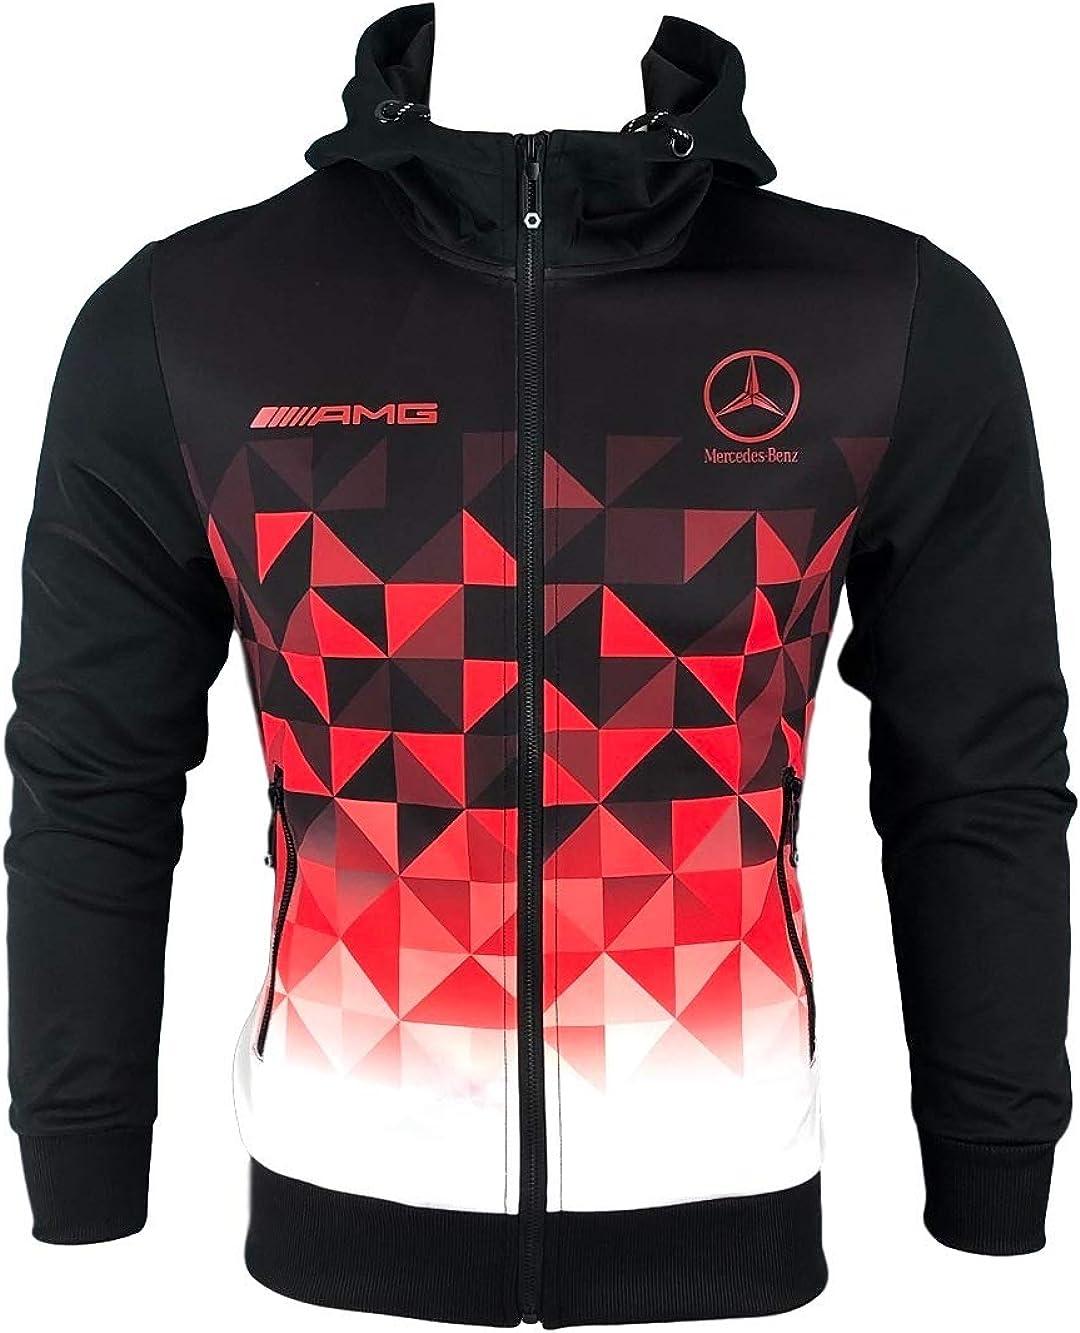 Furia Rossa Surv/êtement Noir Rouge Blanc Logo Mercedes AMG T117-R